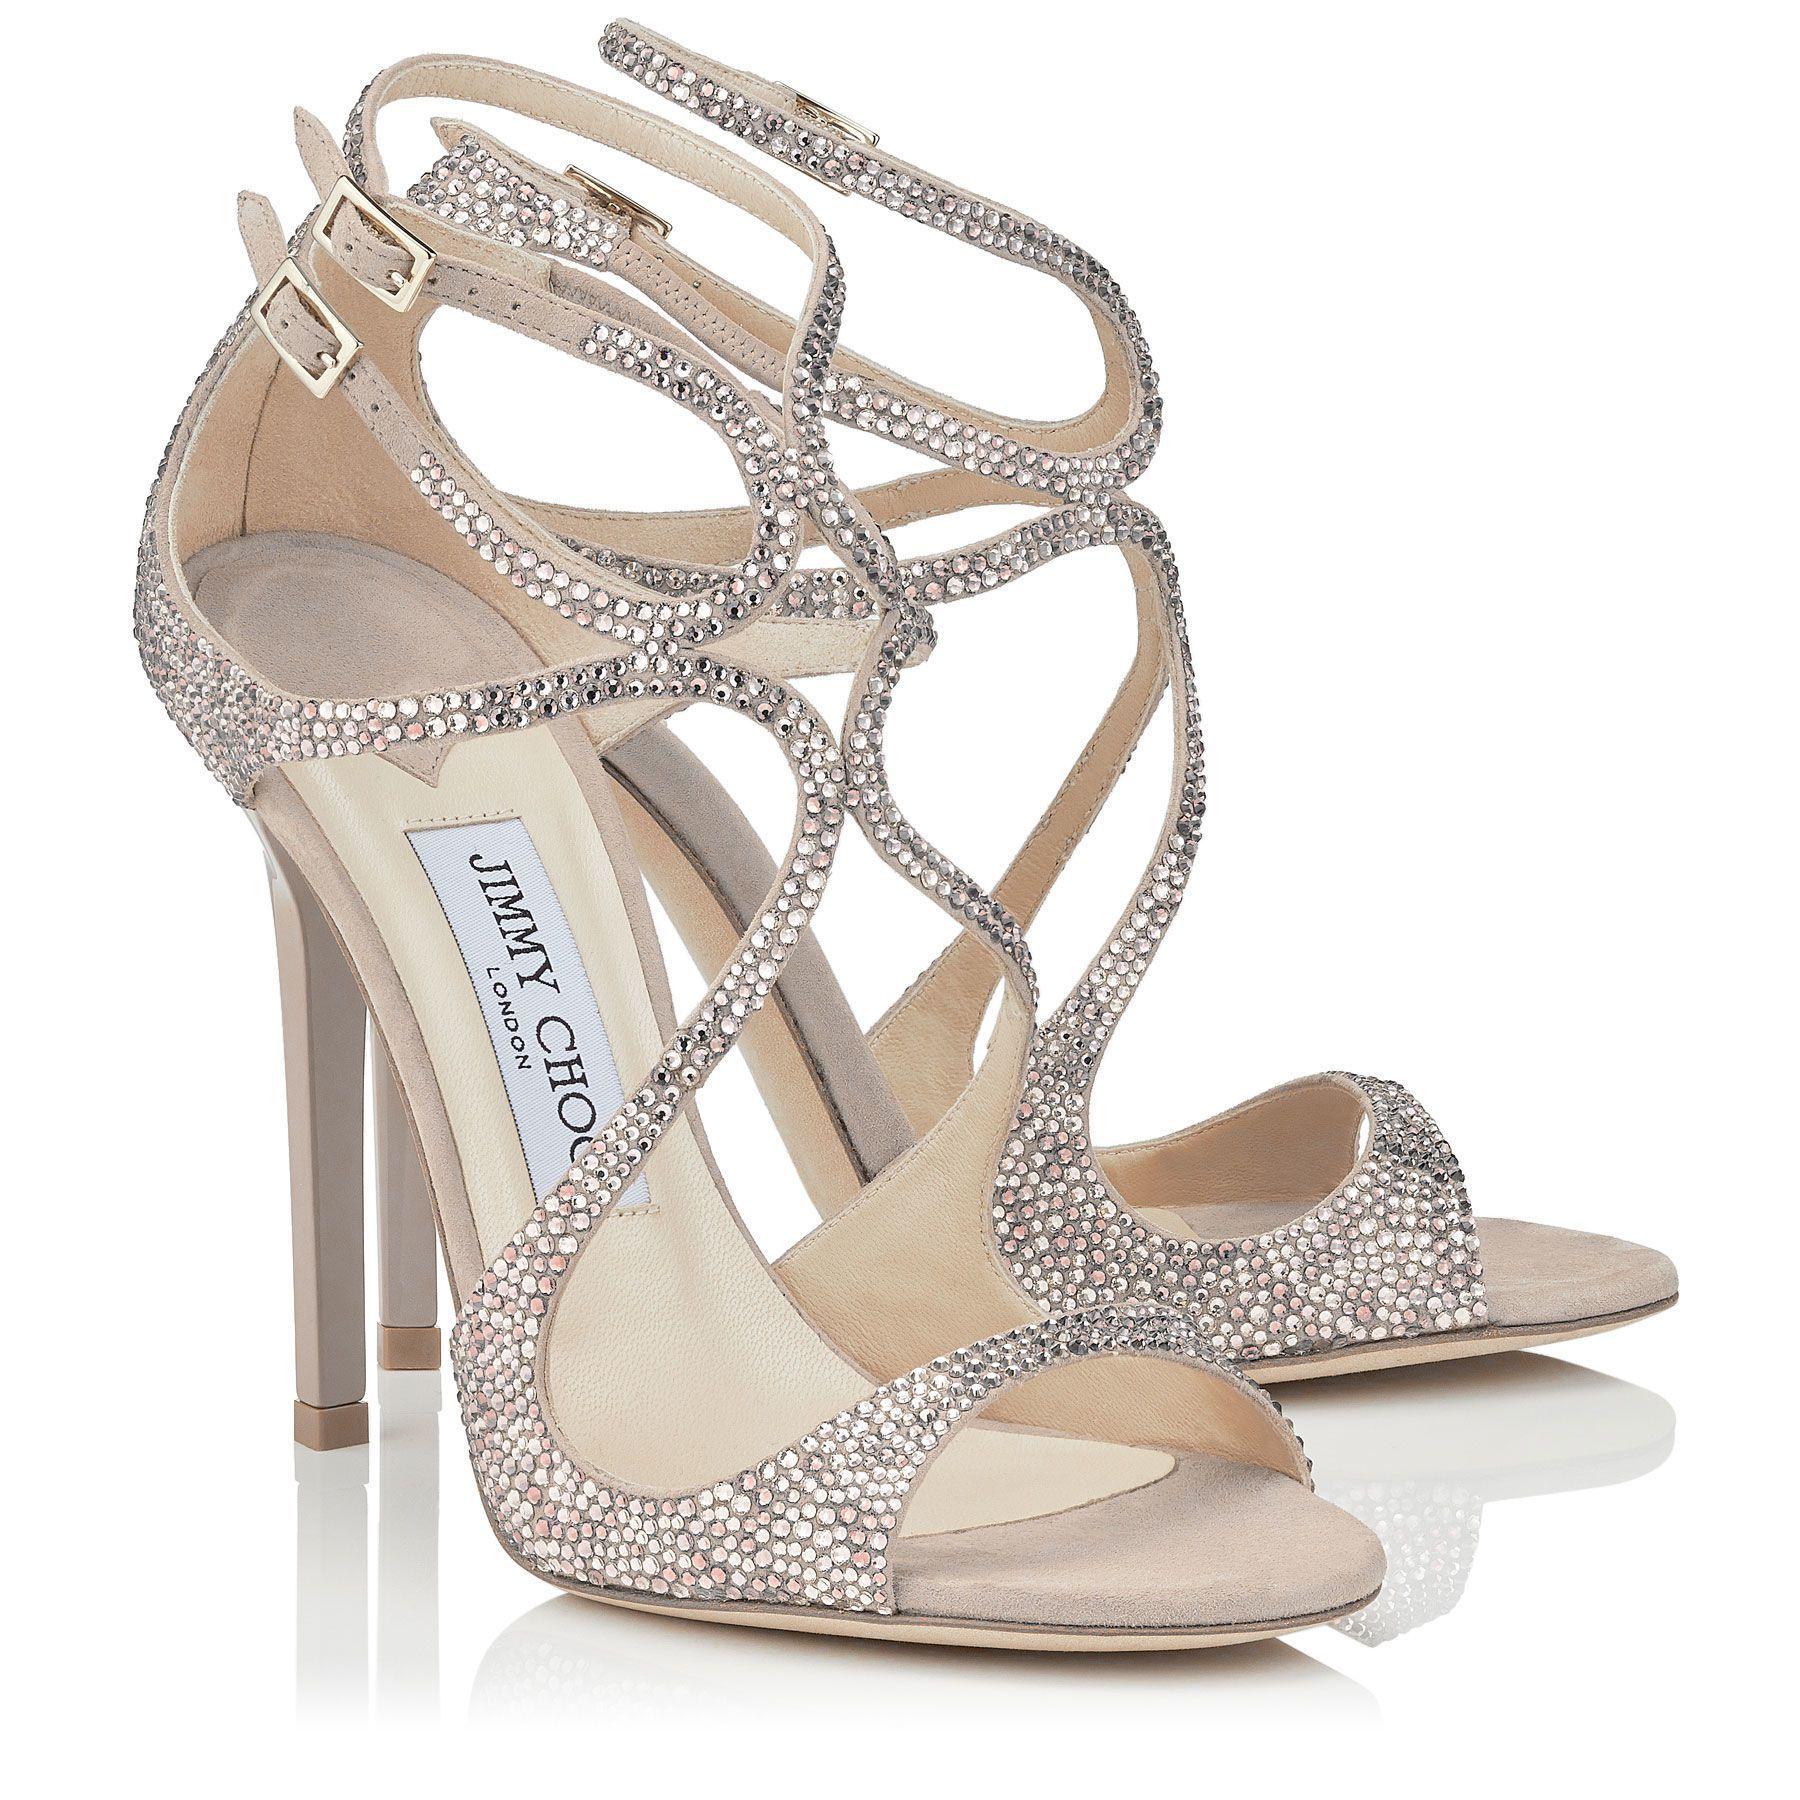 Jimmy Choo Sapatos Que Sao Joias Sandalias Brilhantes